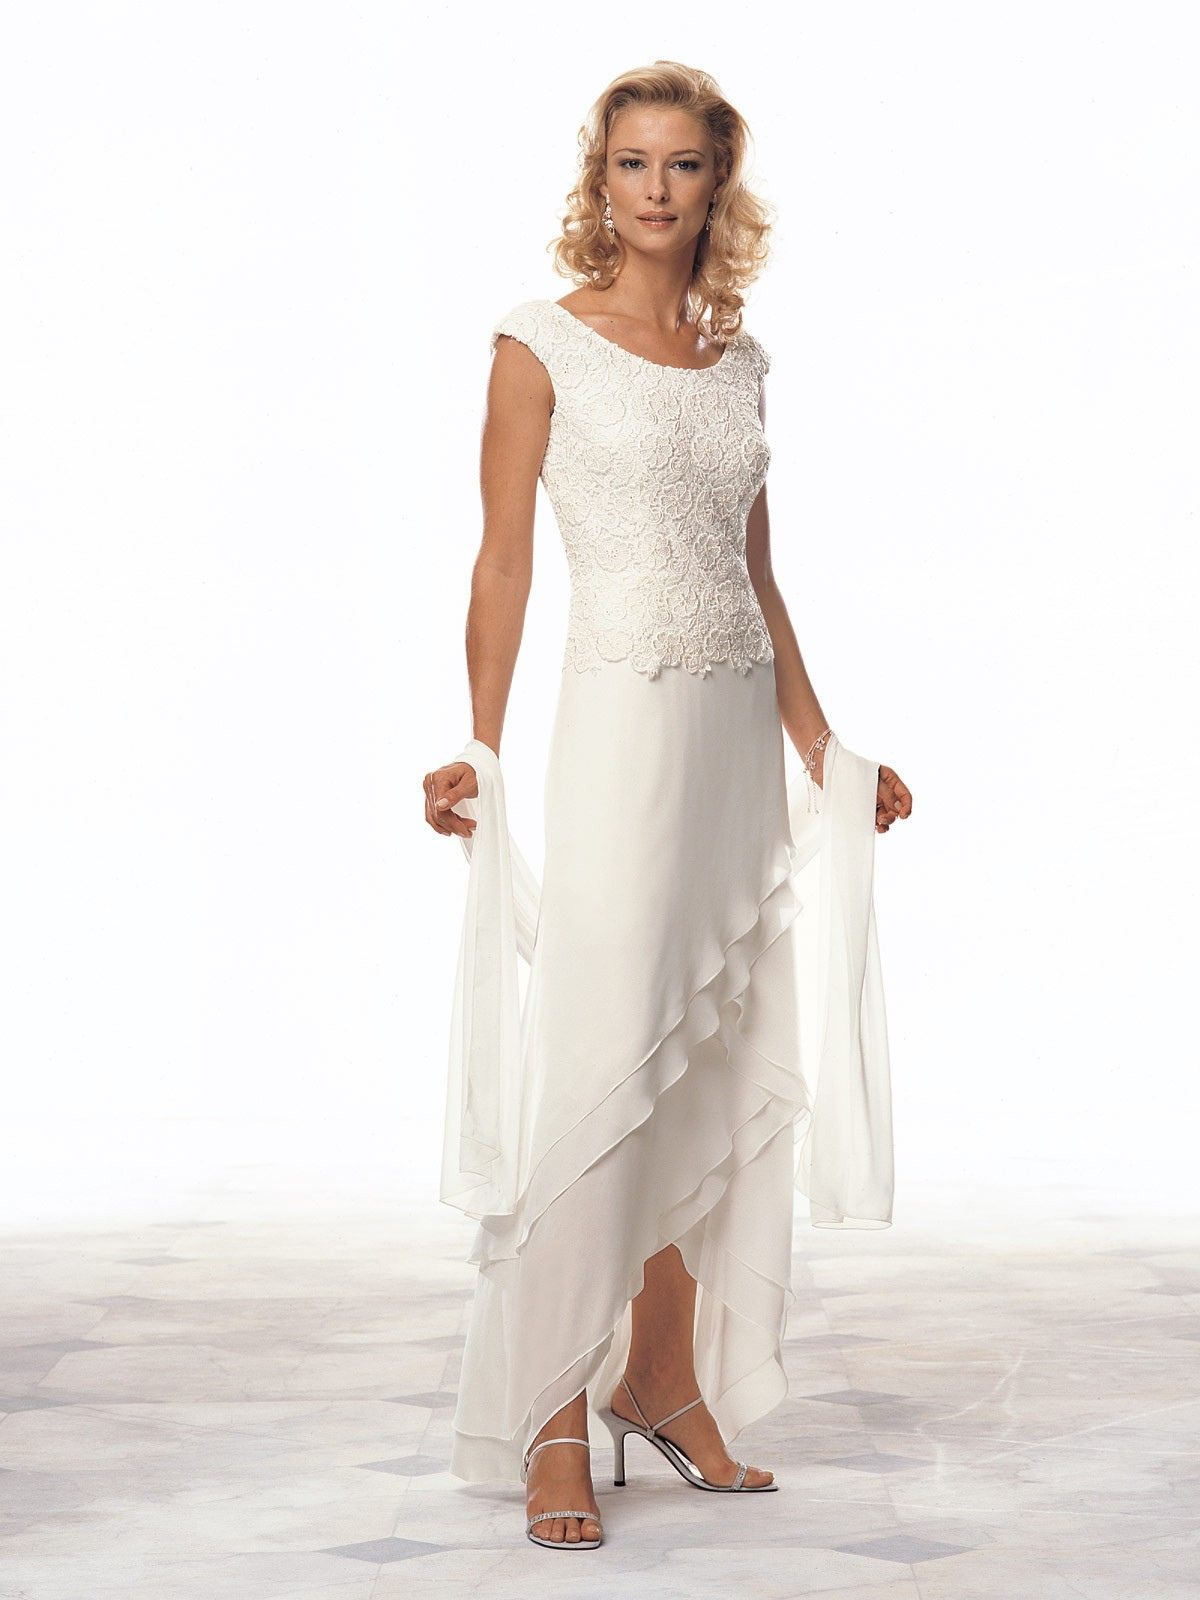 white mother of the groom dresses for beach wedding   Beach ...